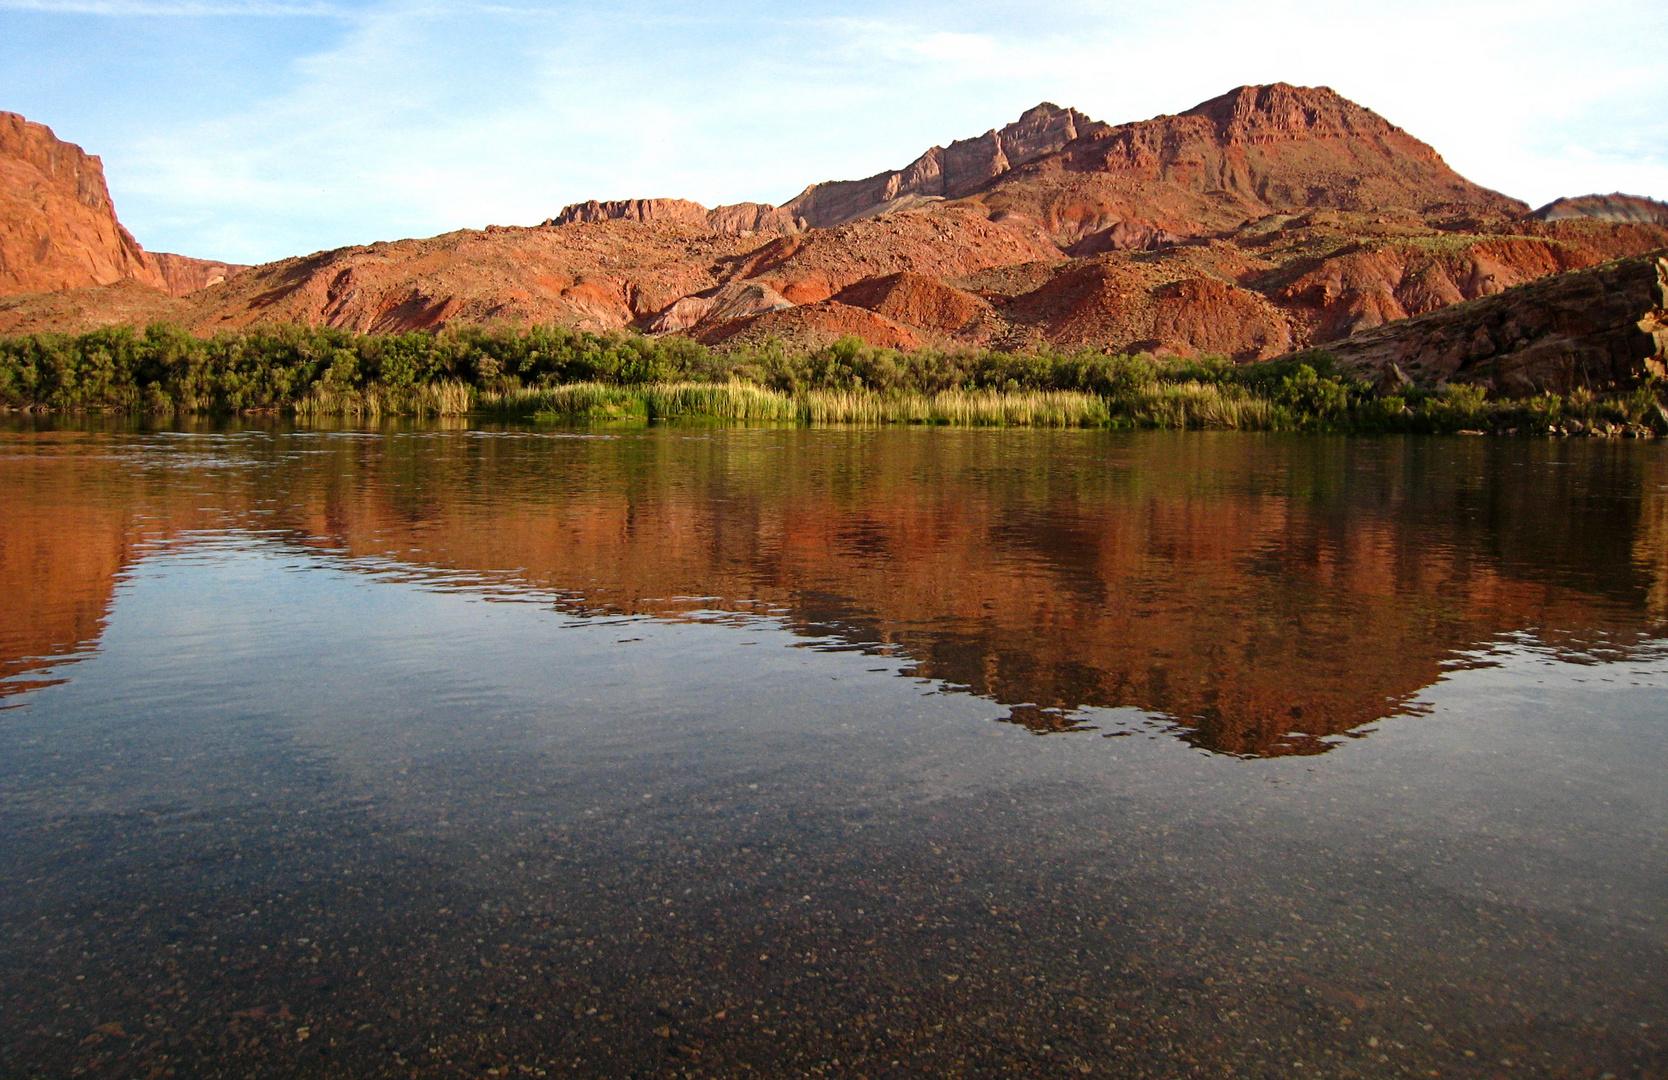 Le fleuve Colorado